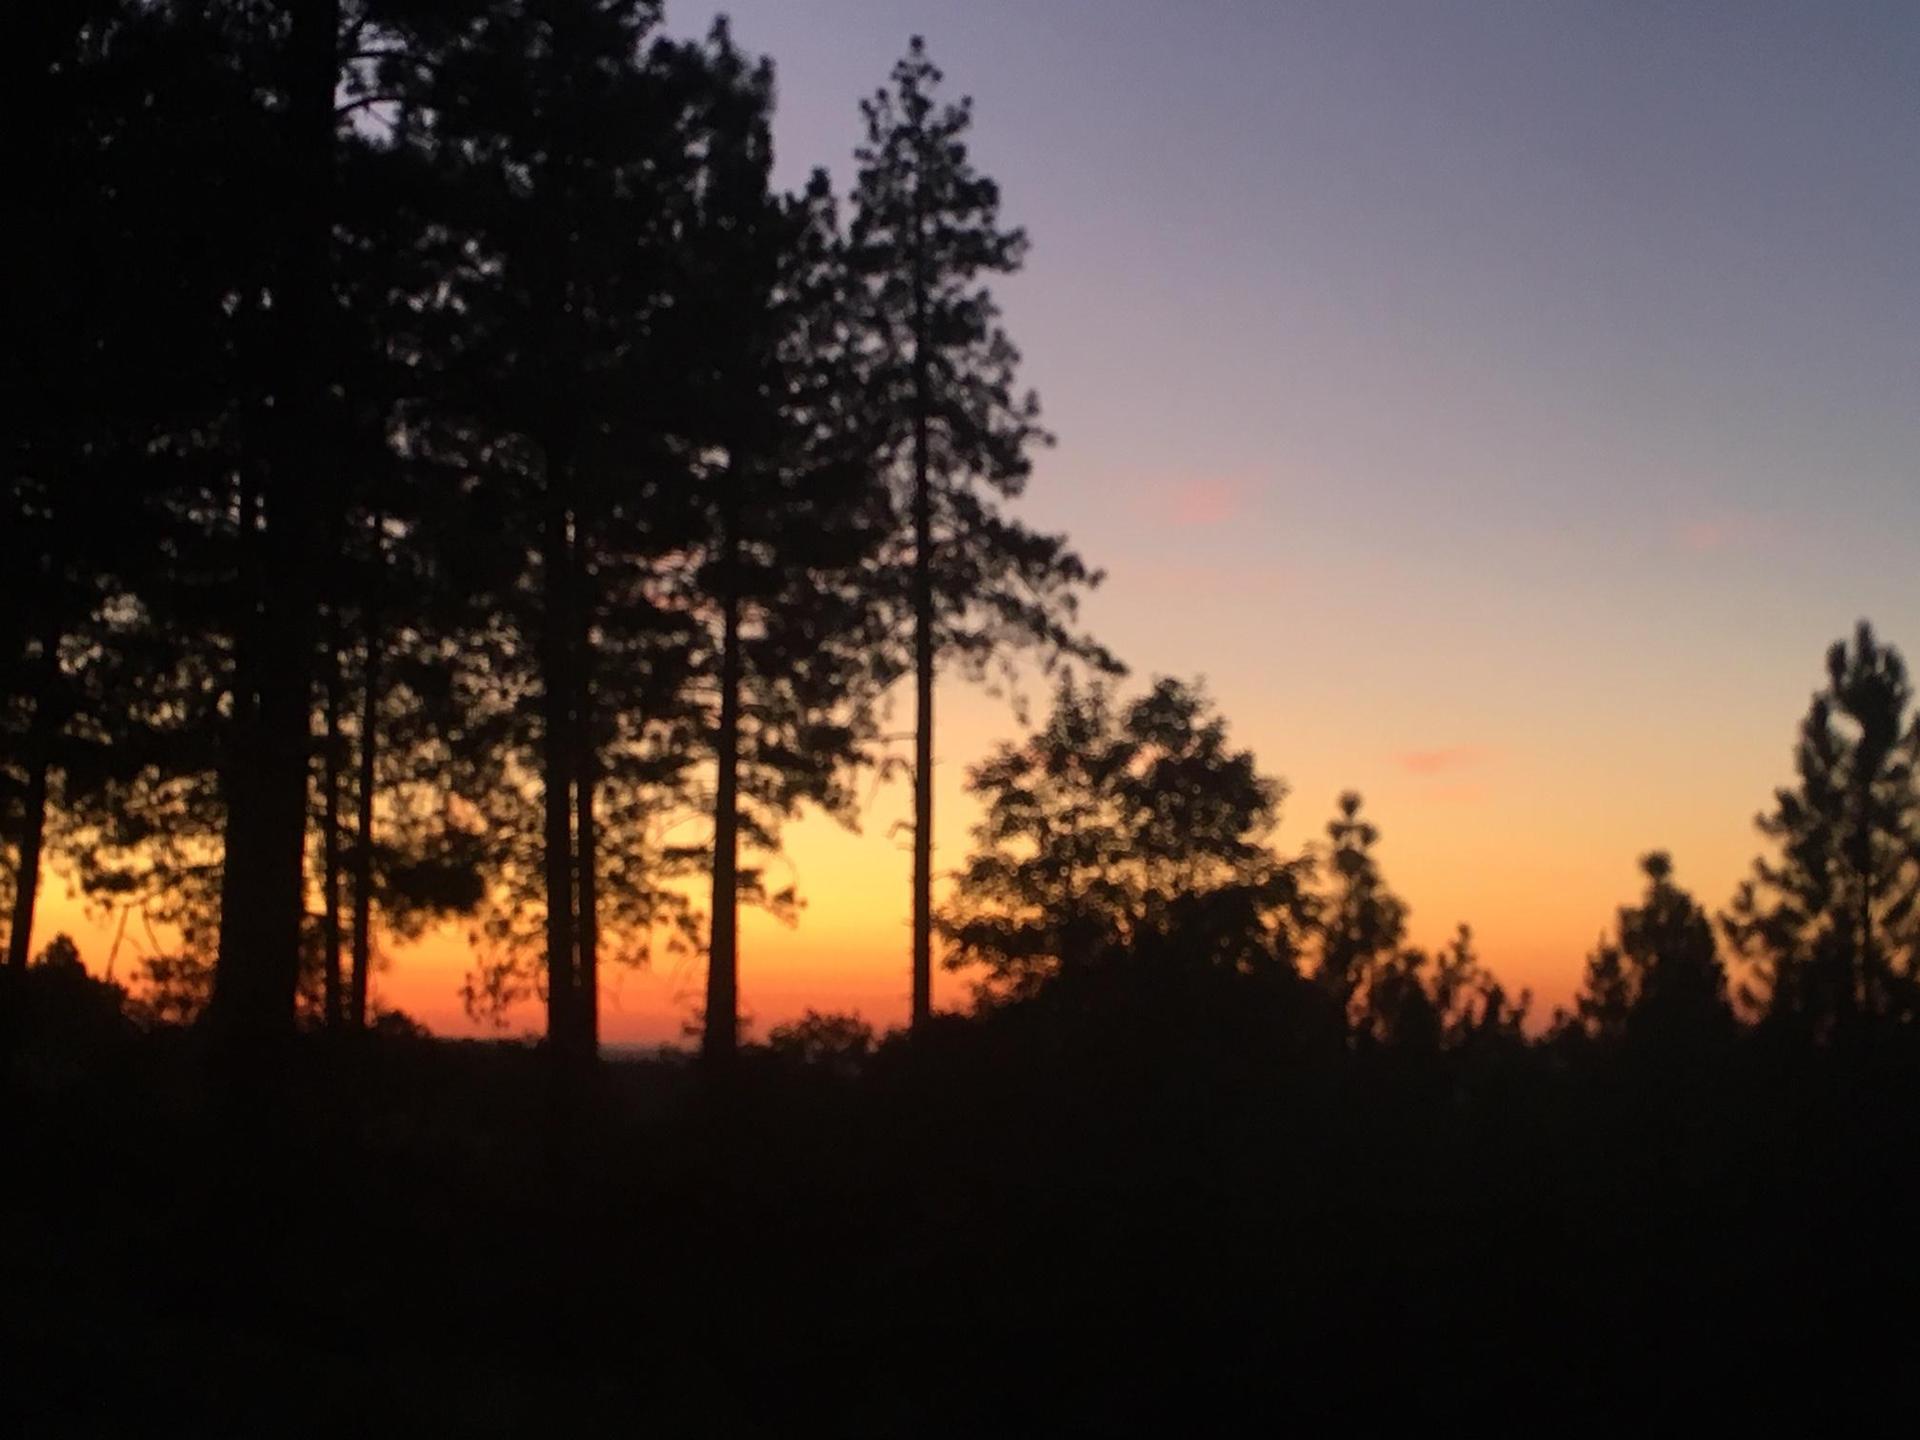 Sunset at Brice Station